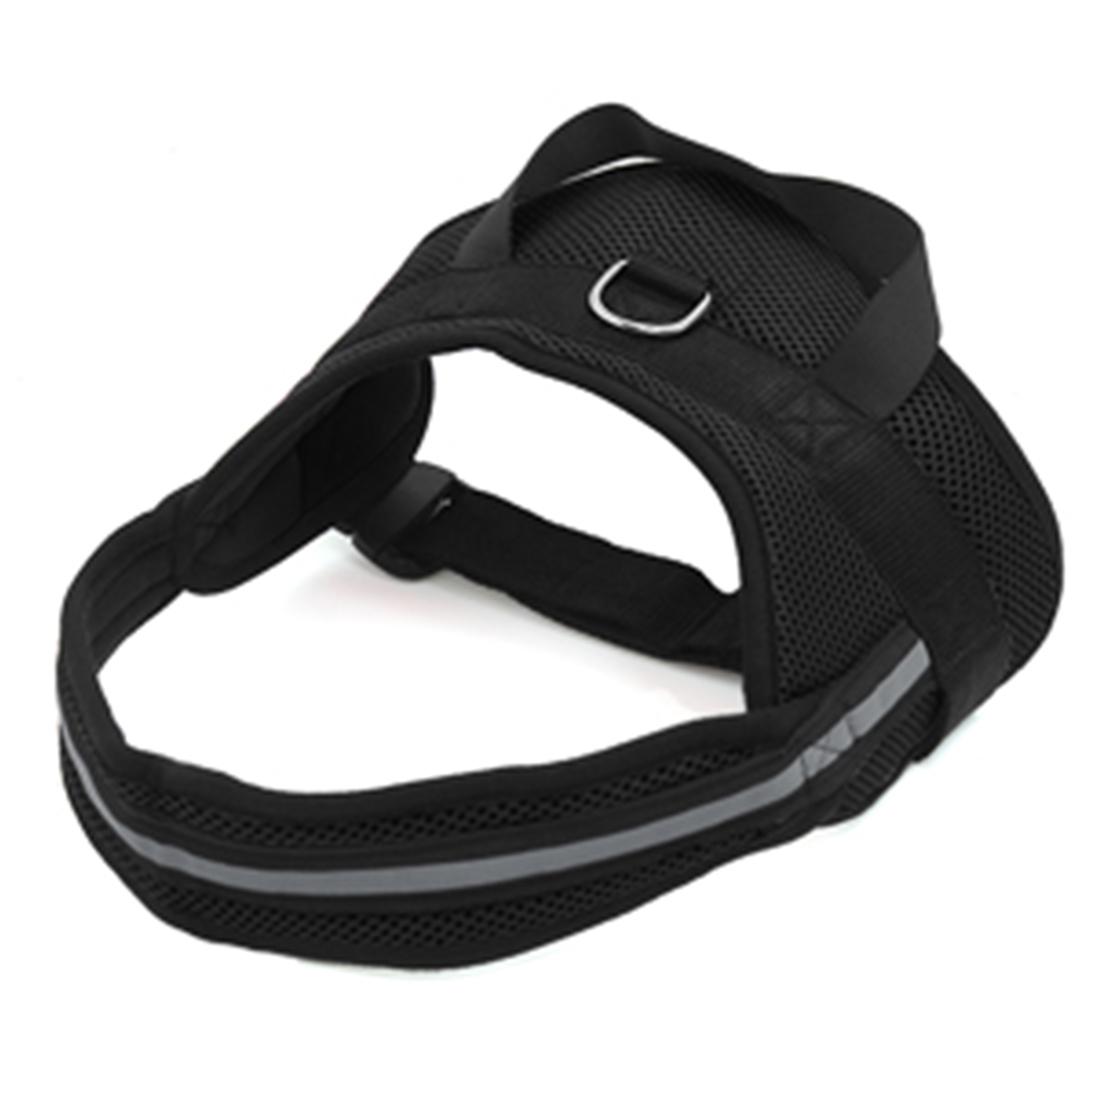 Big Dog Soft Mesh Reflective No Pull Harness Adjustable Large Pet Walk Vest Safe Control Collar Black XS